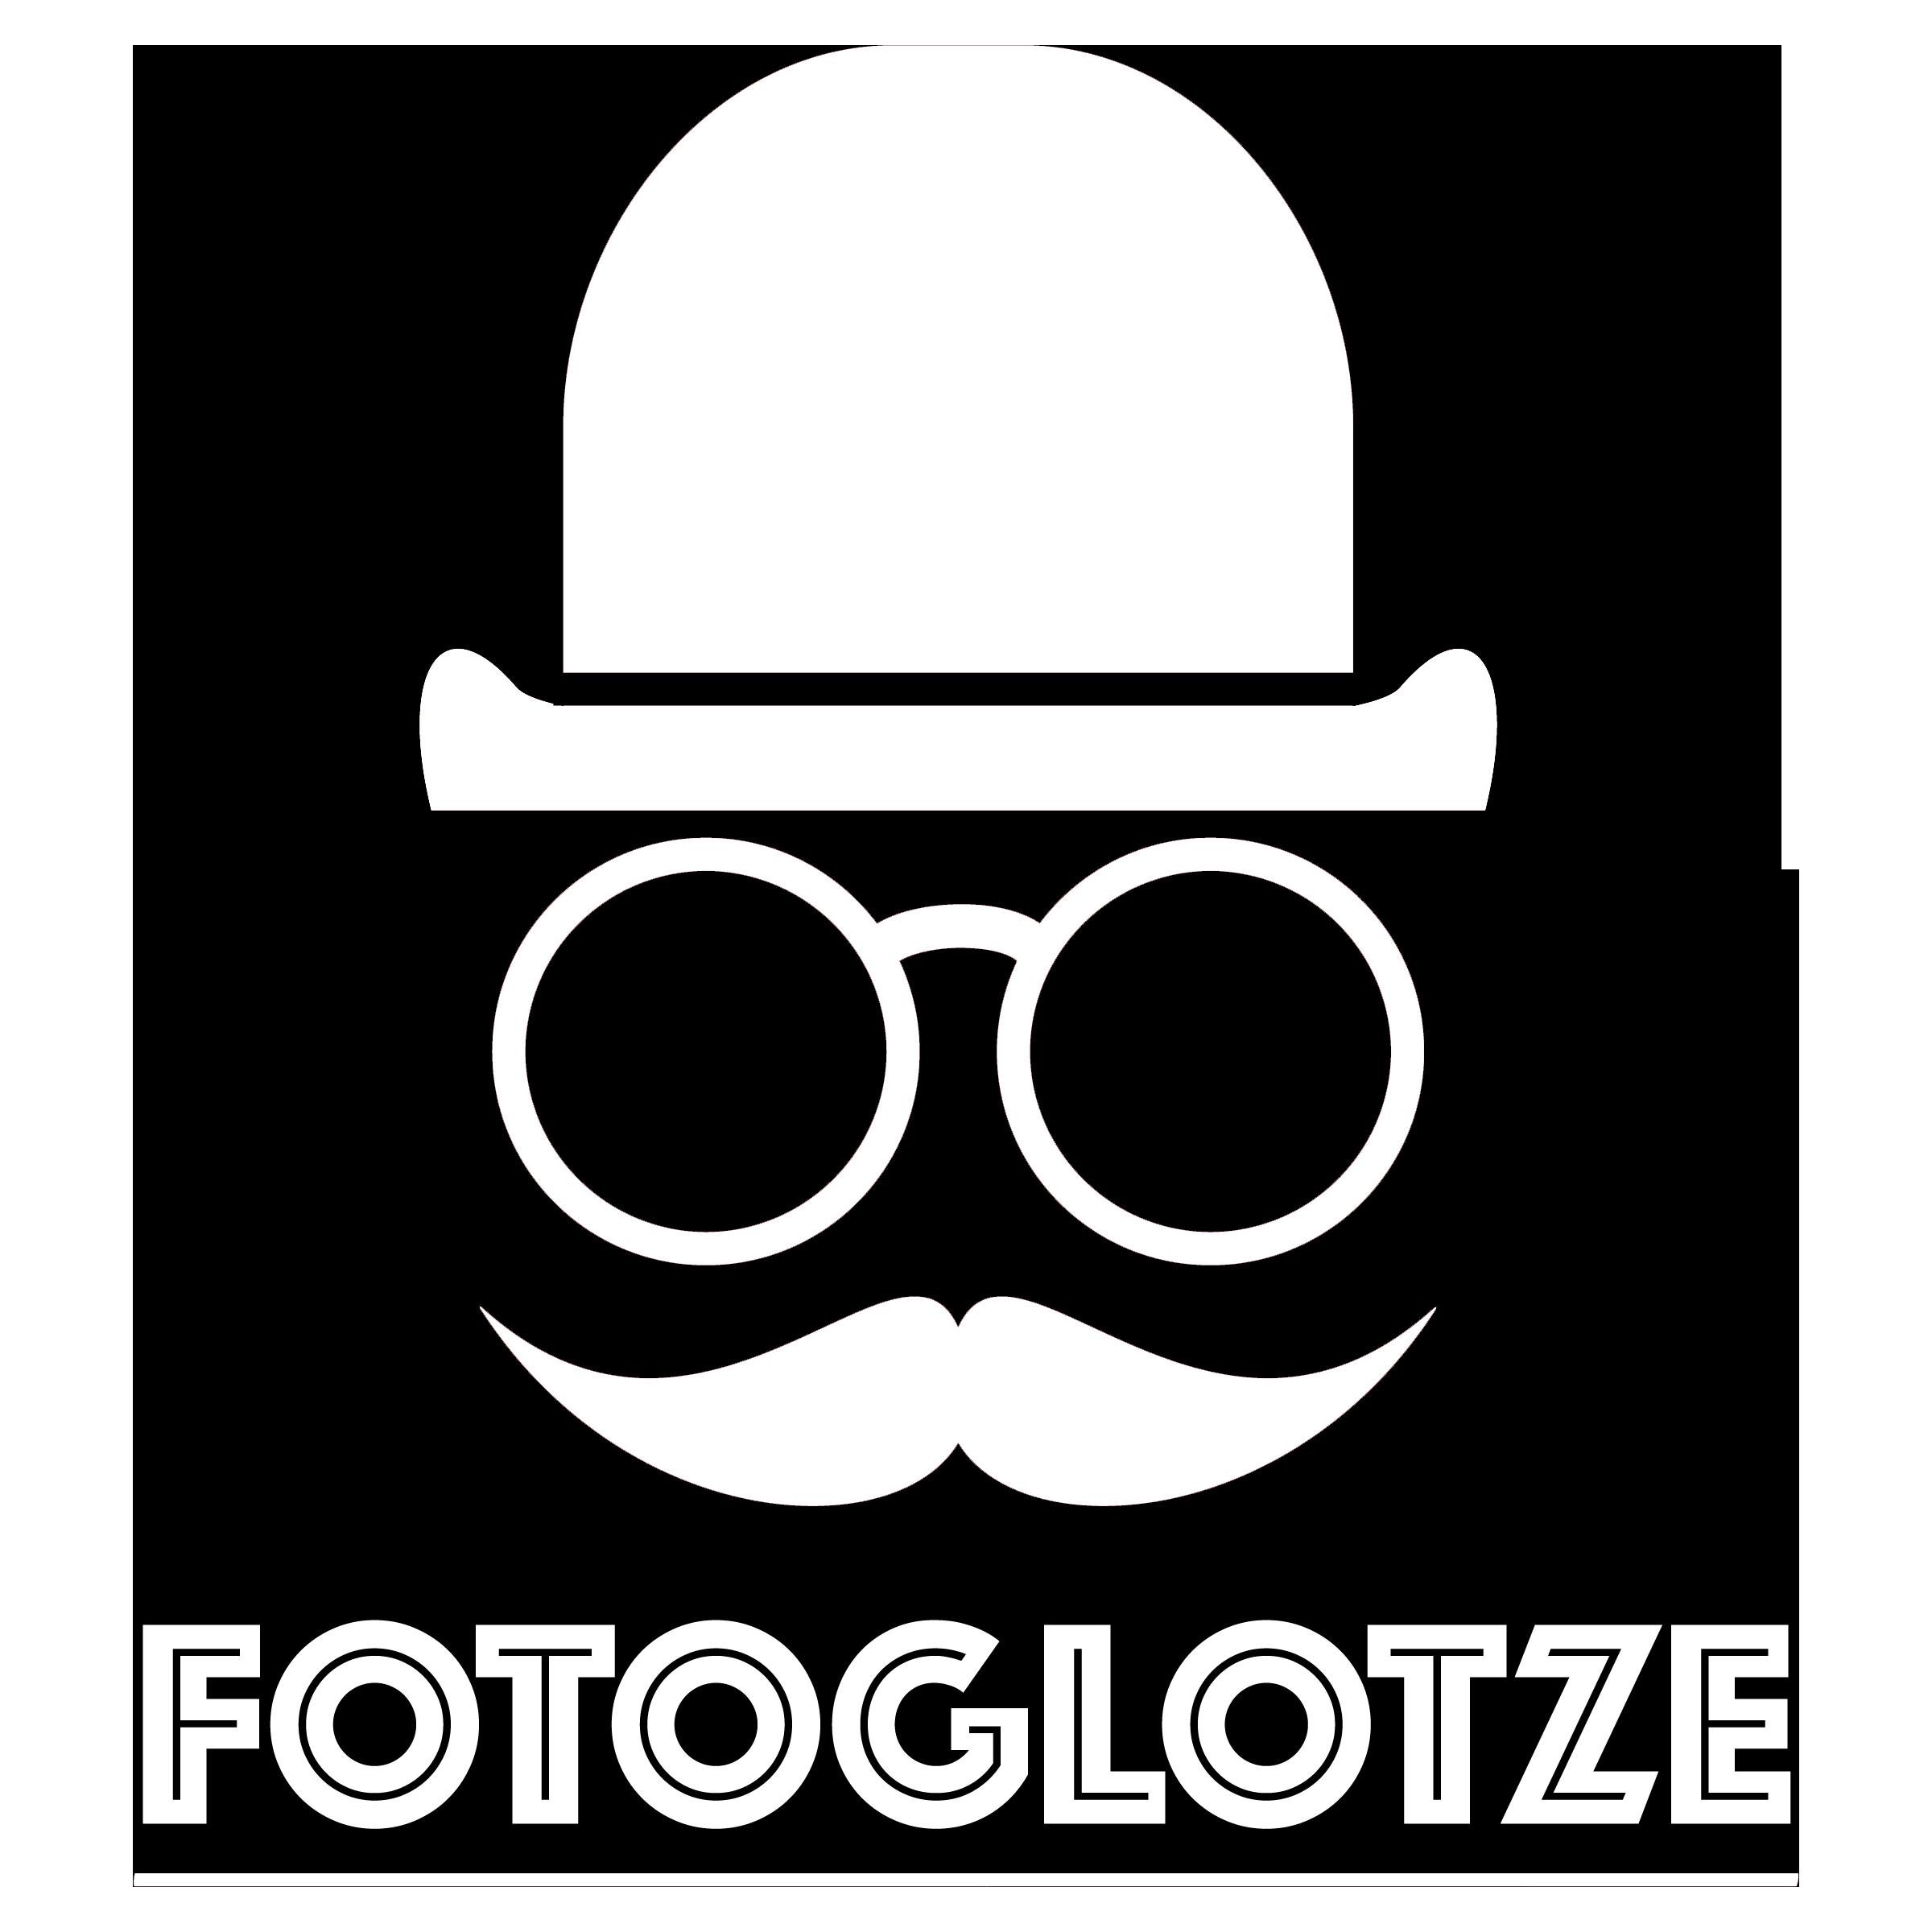 Fotoglotze   Fotoboxen   Photobooth